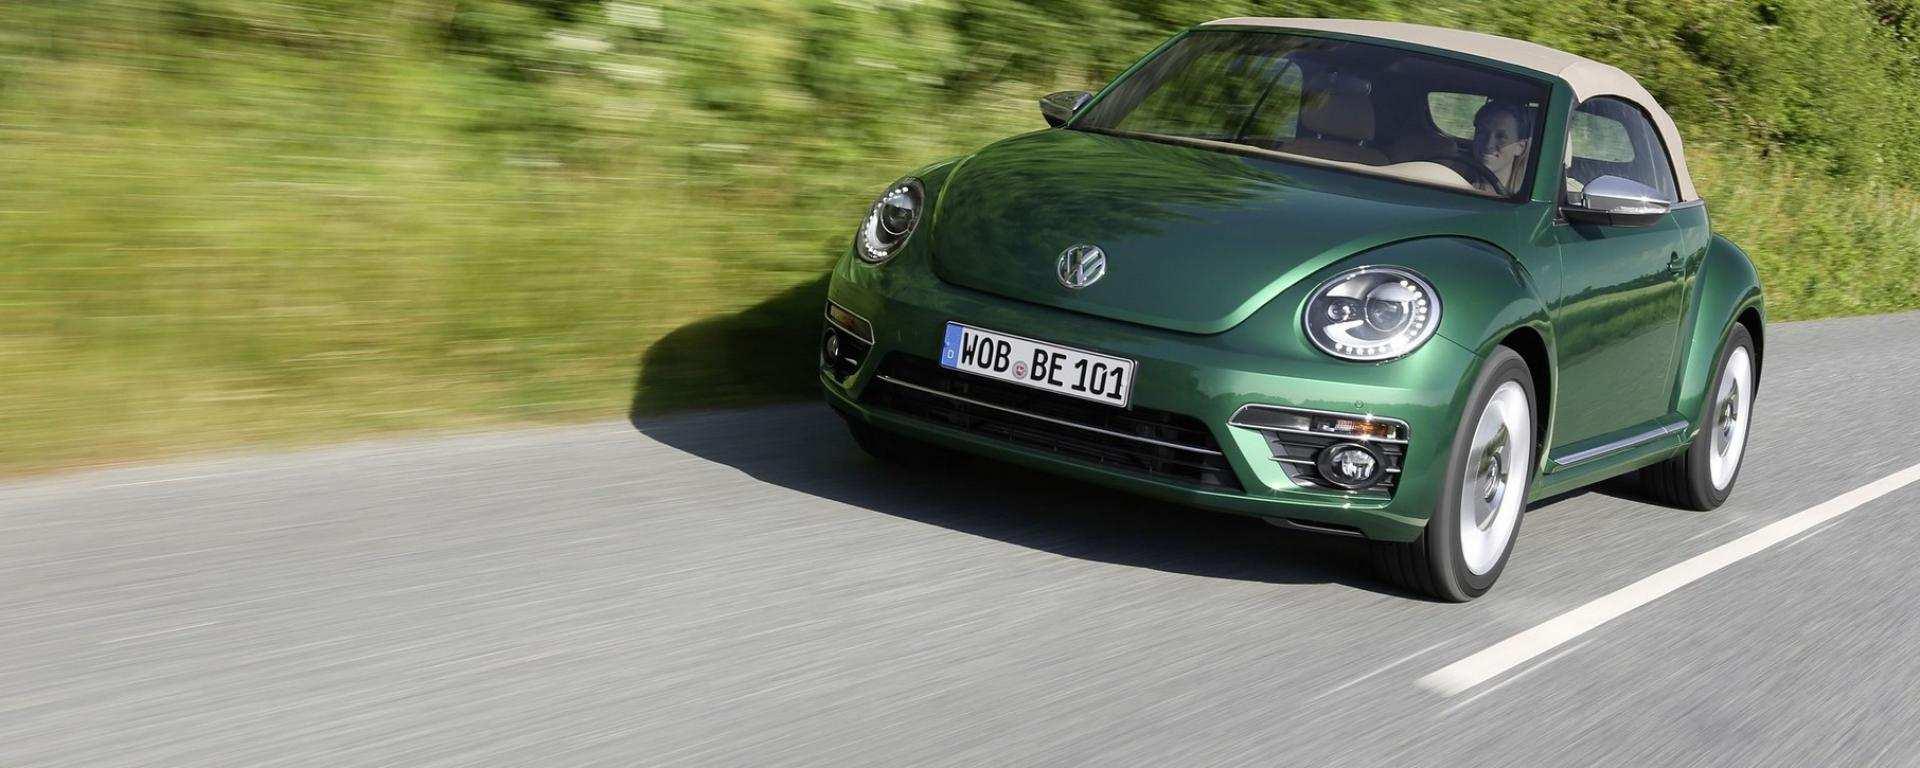 73 New Volkswagen Maggiolino 2019 Exterior for Volkswagen Maggiolino 2019